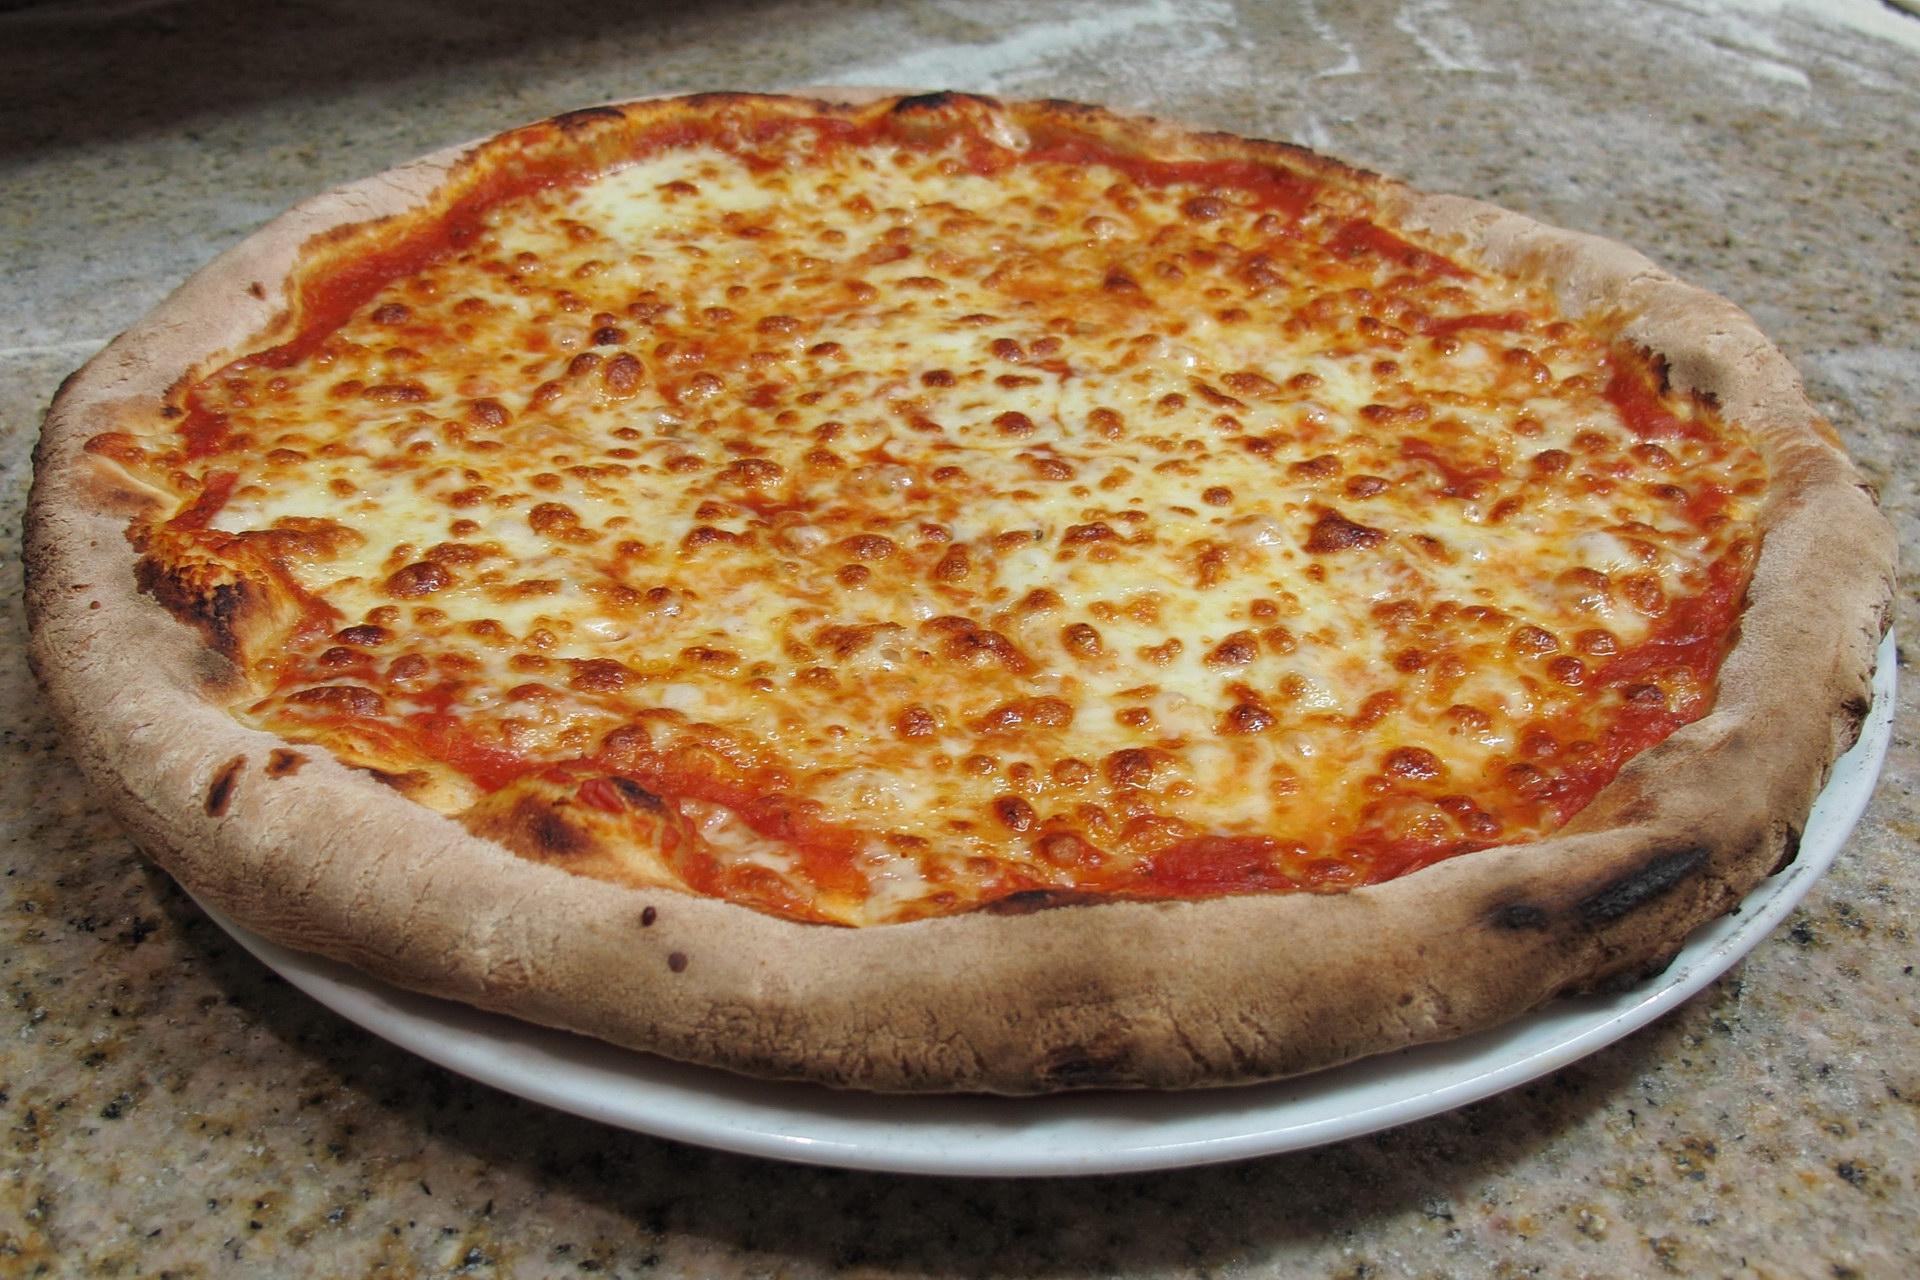 Le-Mediterraneen-Pizza-Braine-l-Alleud-0024.jpg